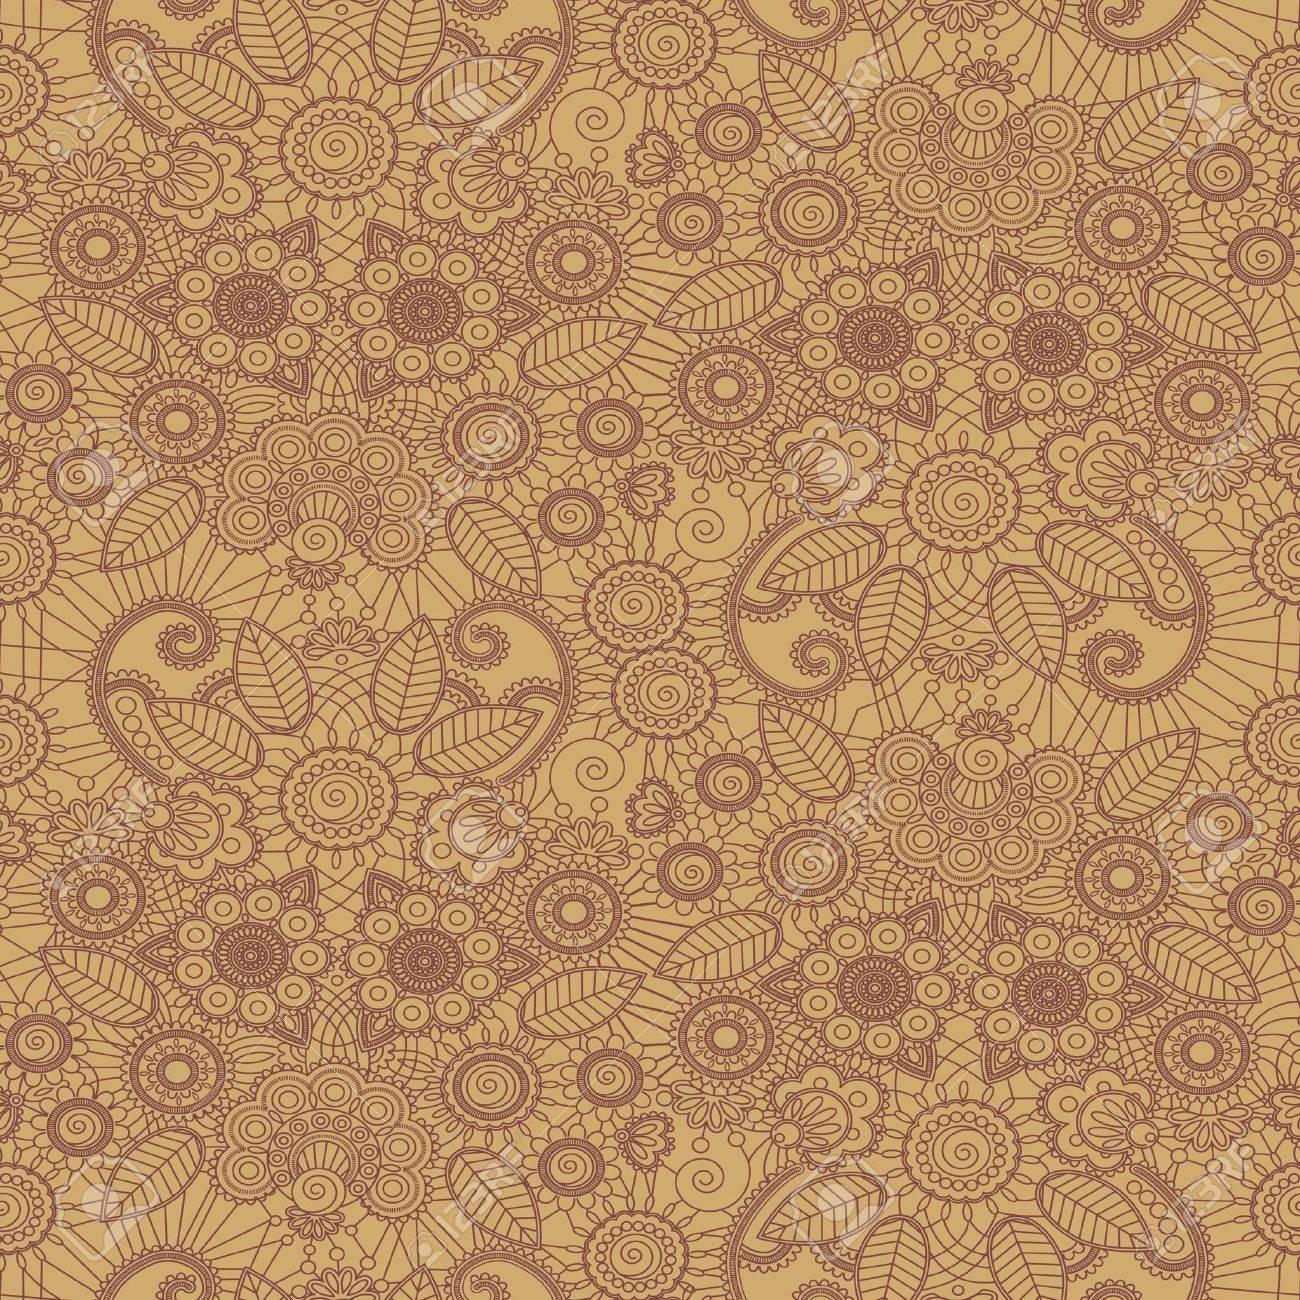 Hand-Drawn henna Mehndi Abstract Flowers. Vector illustration. Seamless. Stock Vector - 11650749